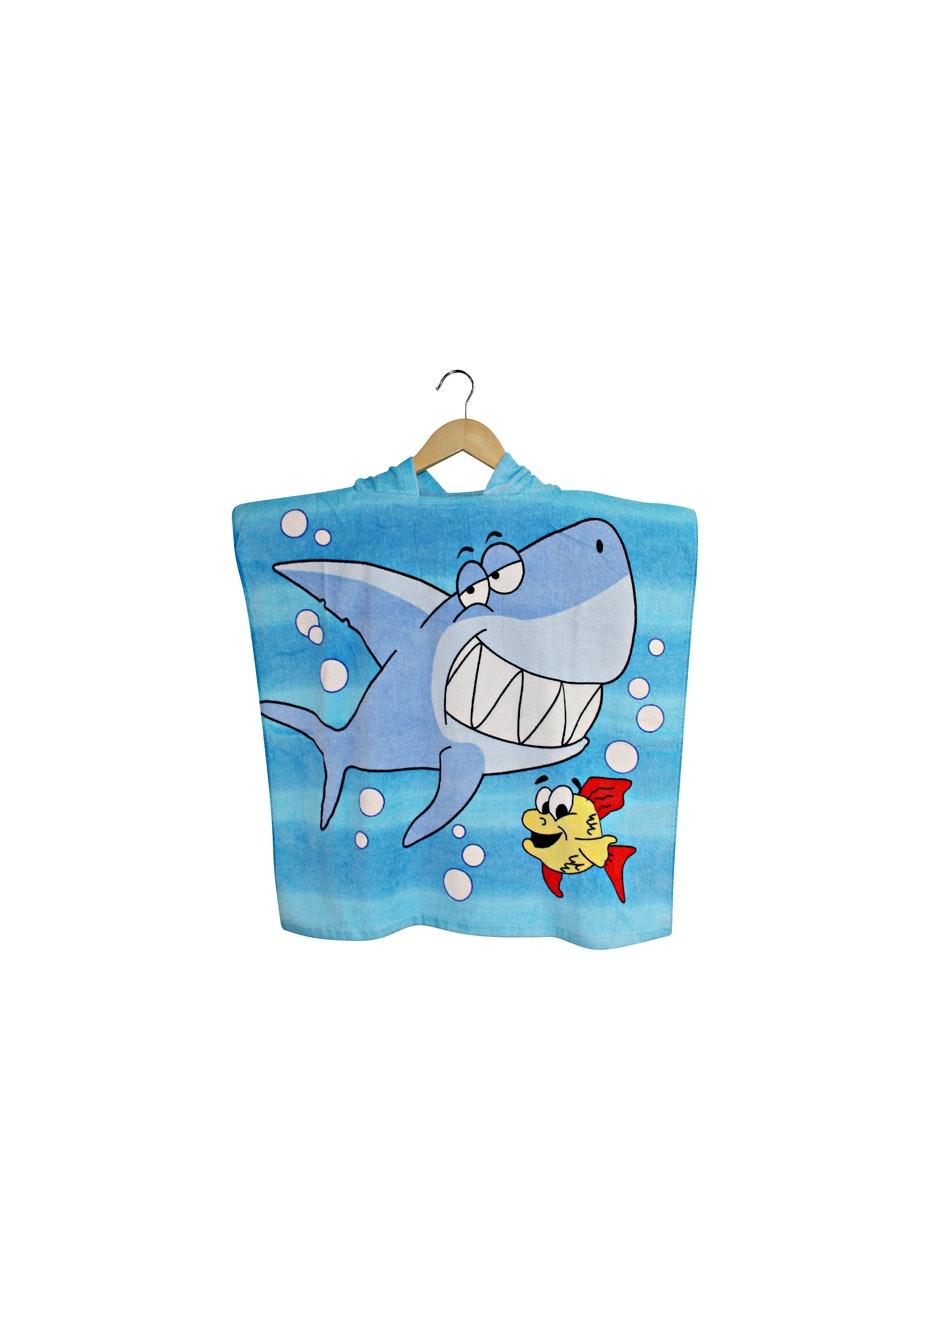 100% Cotton Kids Poncho 60x120cm Neck Size 5.5cm - Sammy Shark